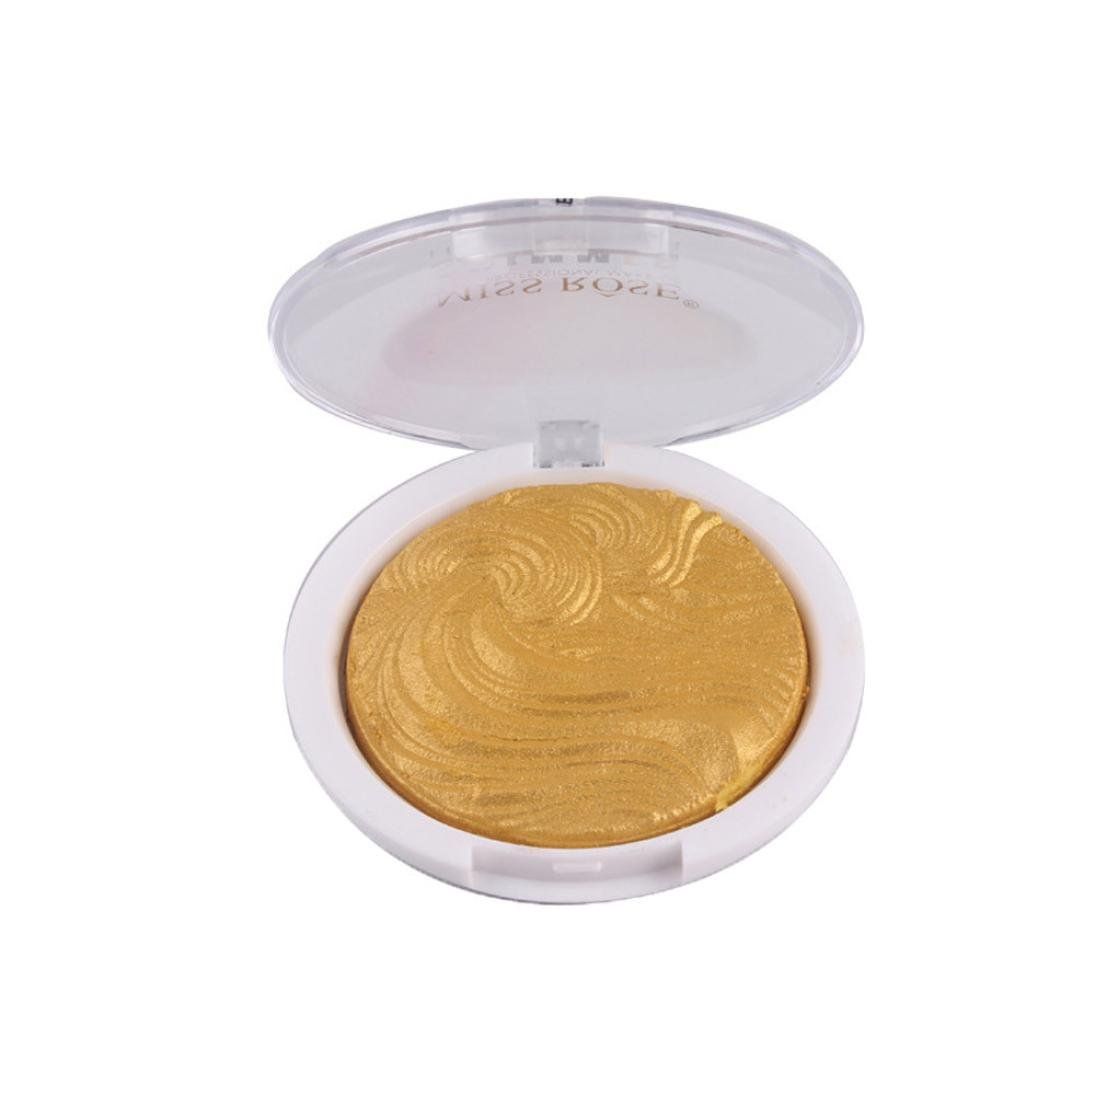 Sixcup 3D Shimmer Highlighter Face Powder Palette Face Base shine Illuminator Compact Makeup Powder (Bronzing)